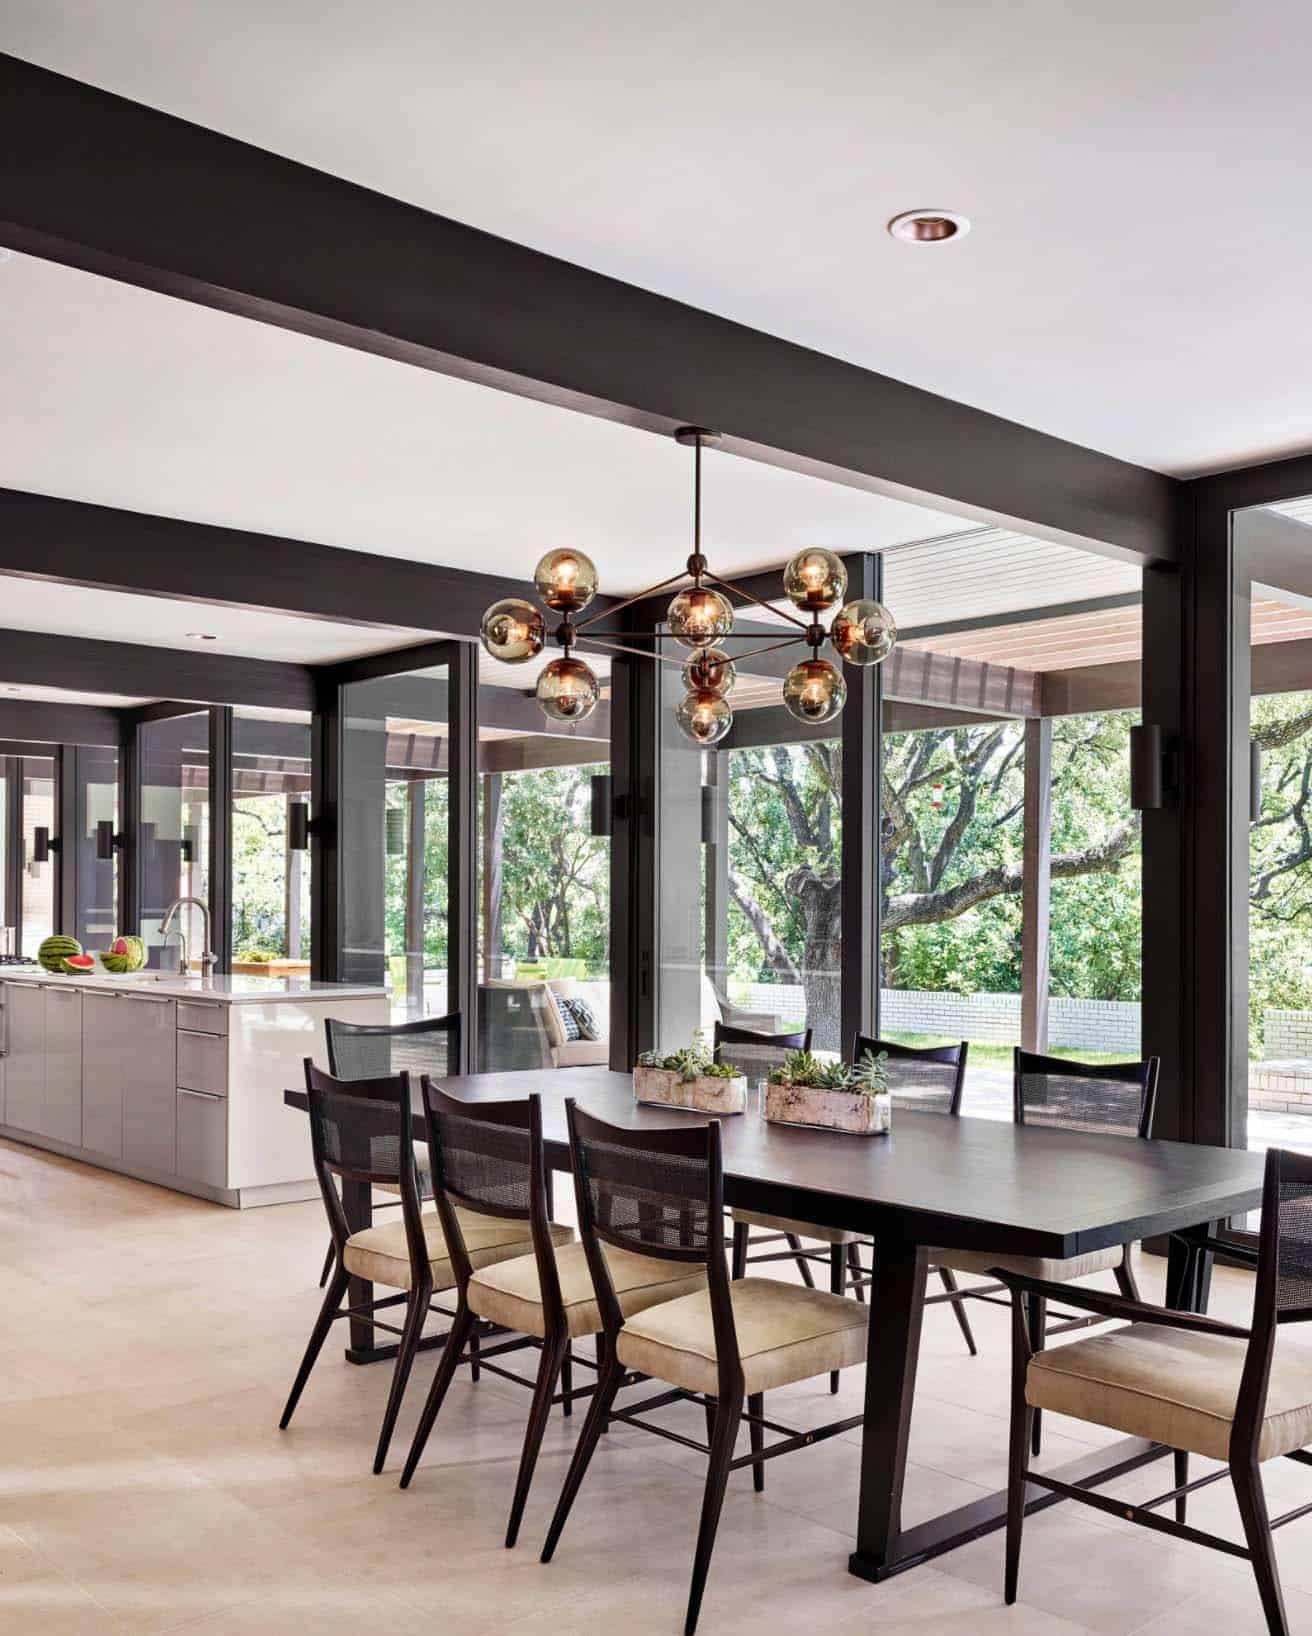 Mid century modern renovation creates inspired living in Austin   Dining room design, Dining ...